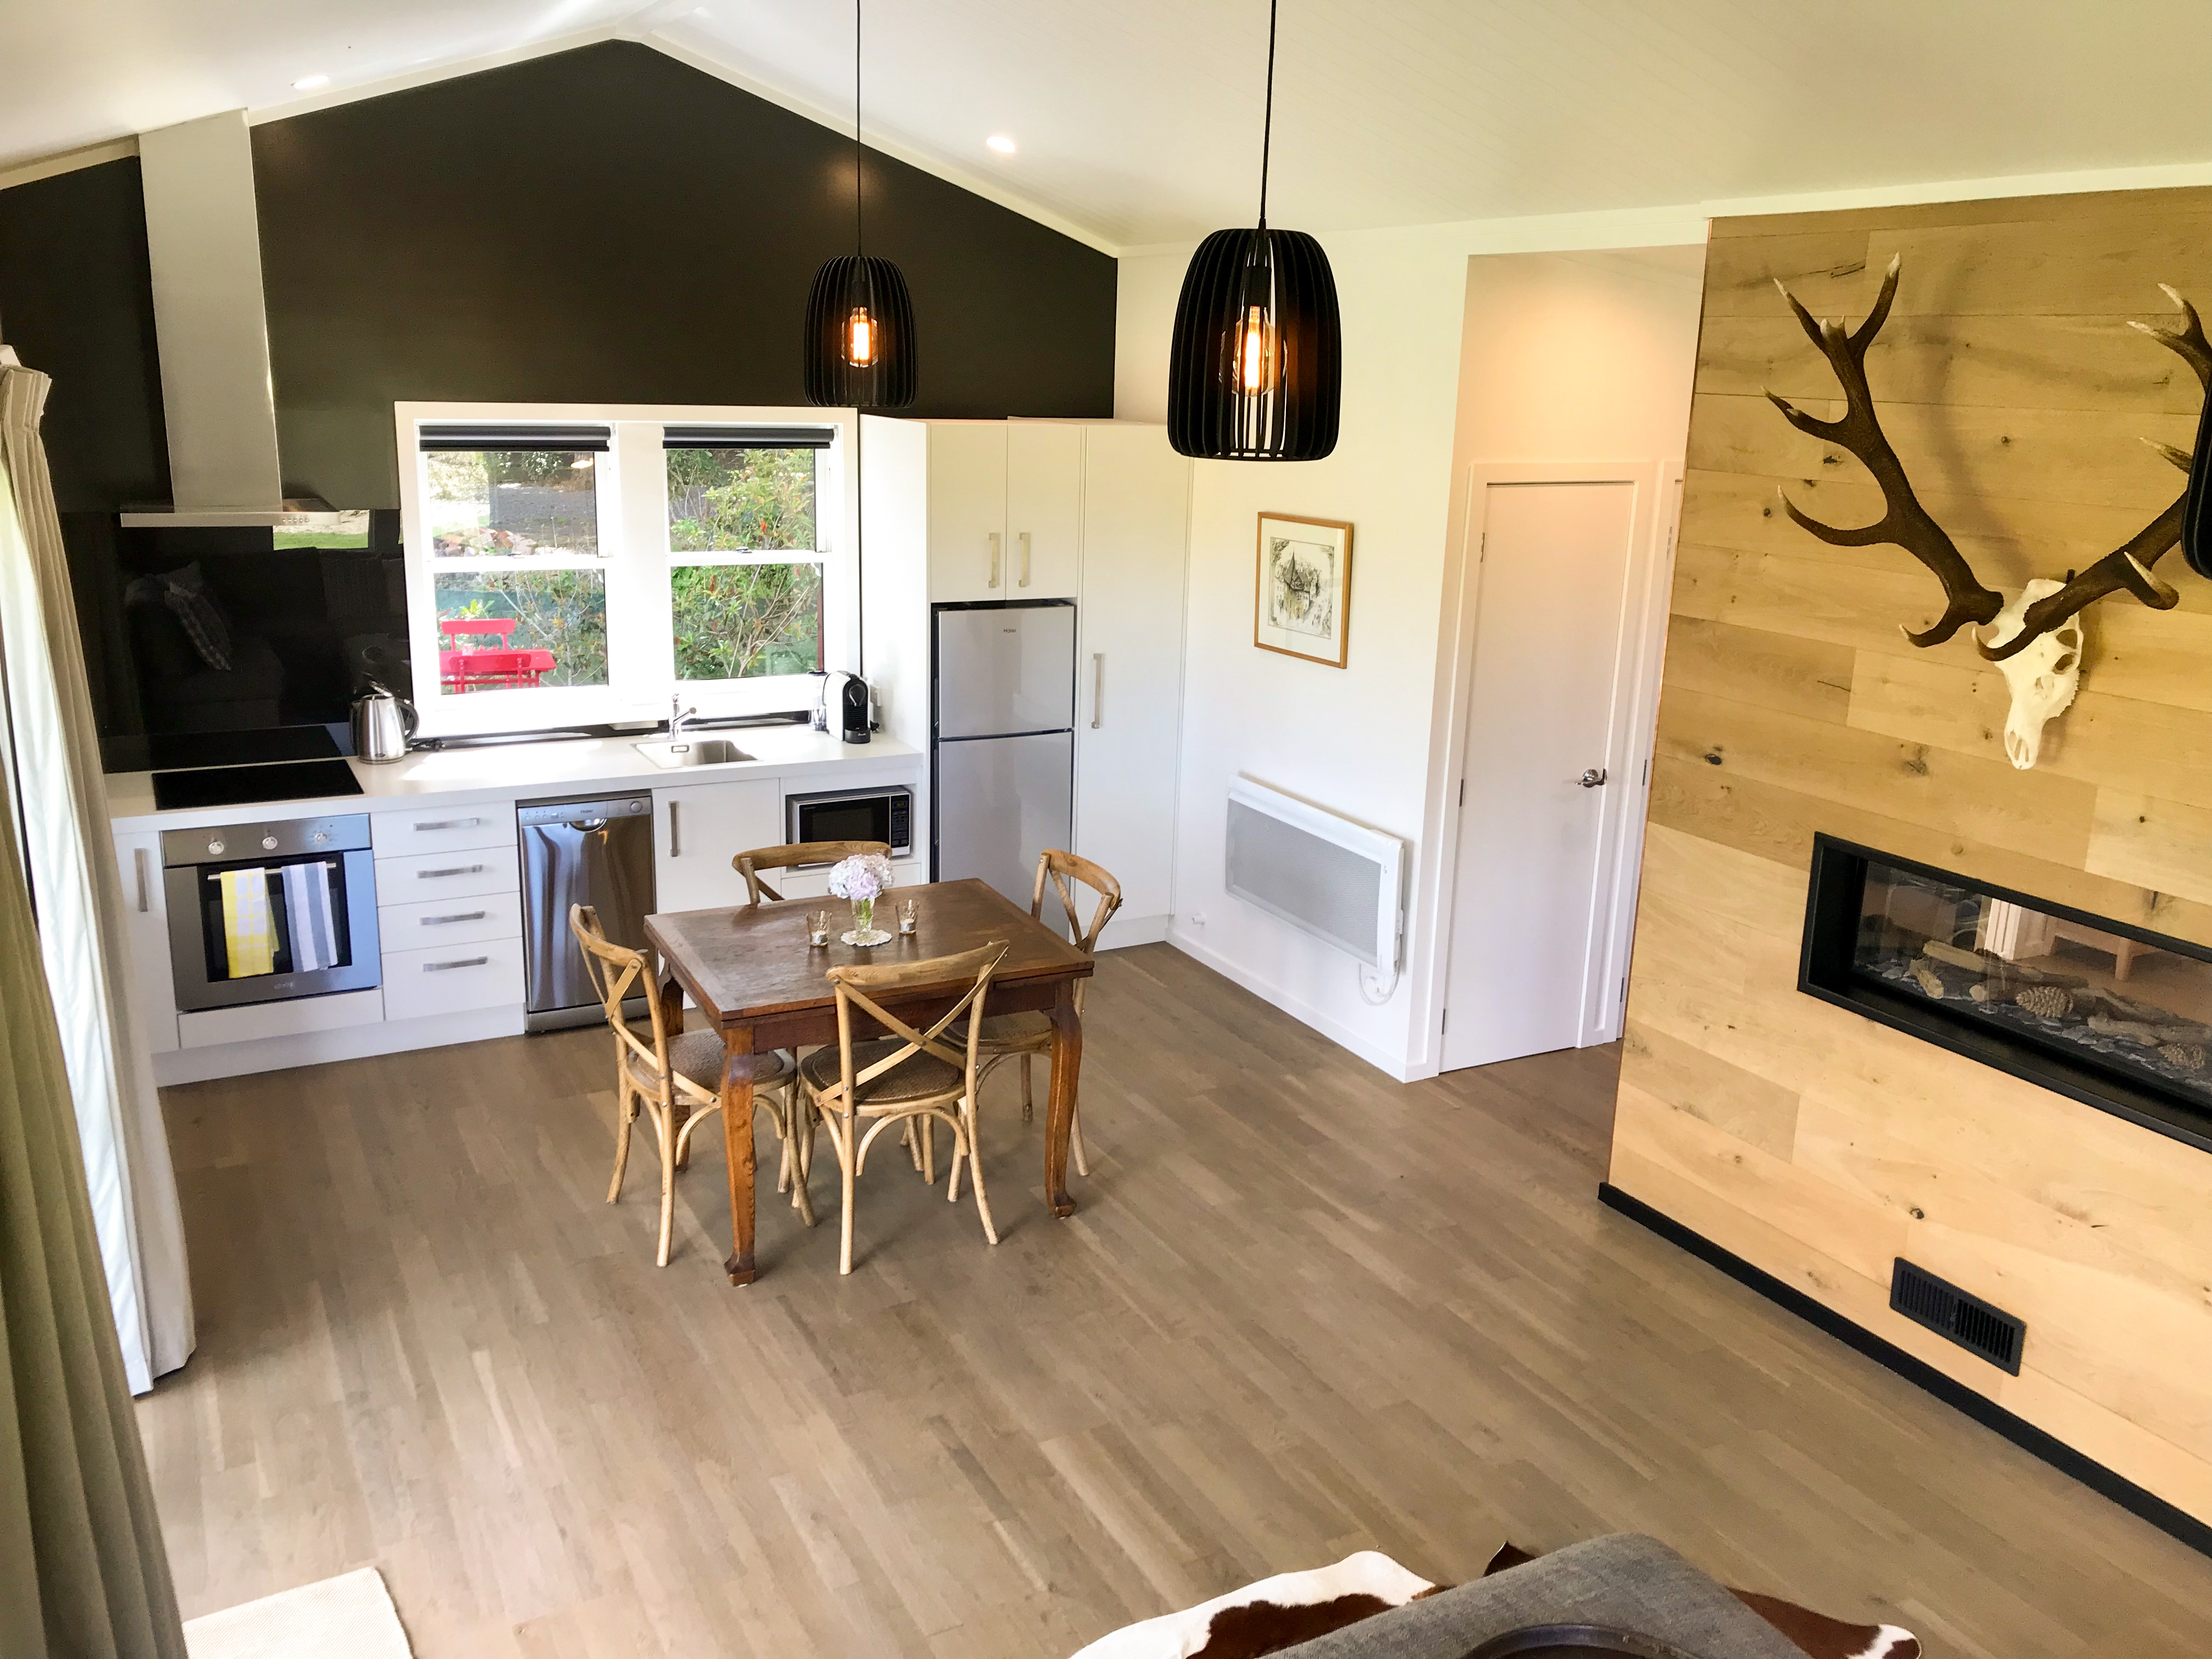 Kitchen_Red_Cotages_Staveley_Accommodation_Mt_Hutt_Methven_Tekapo